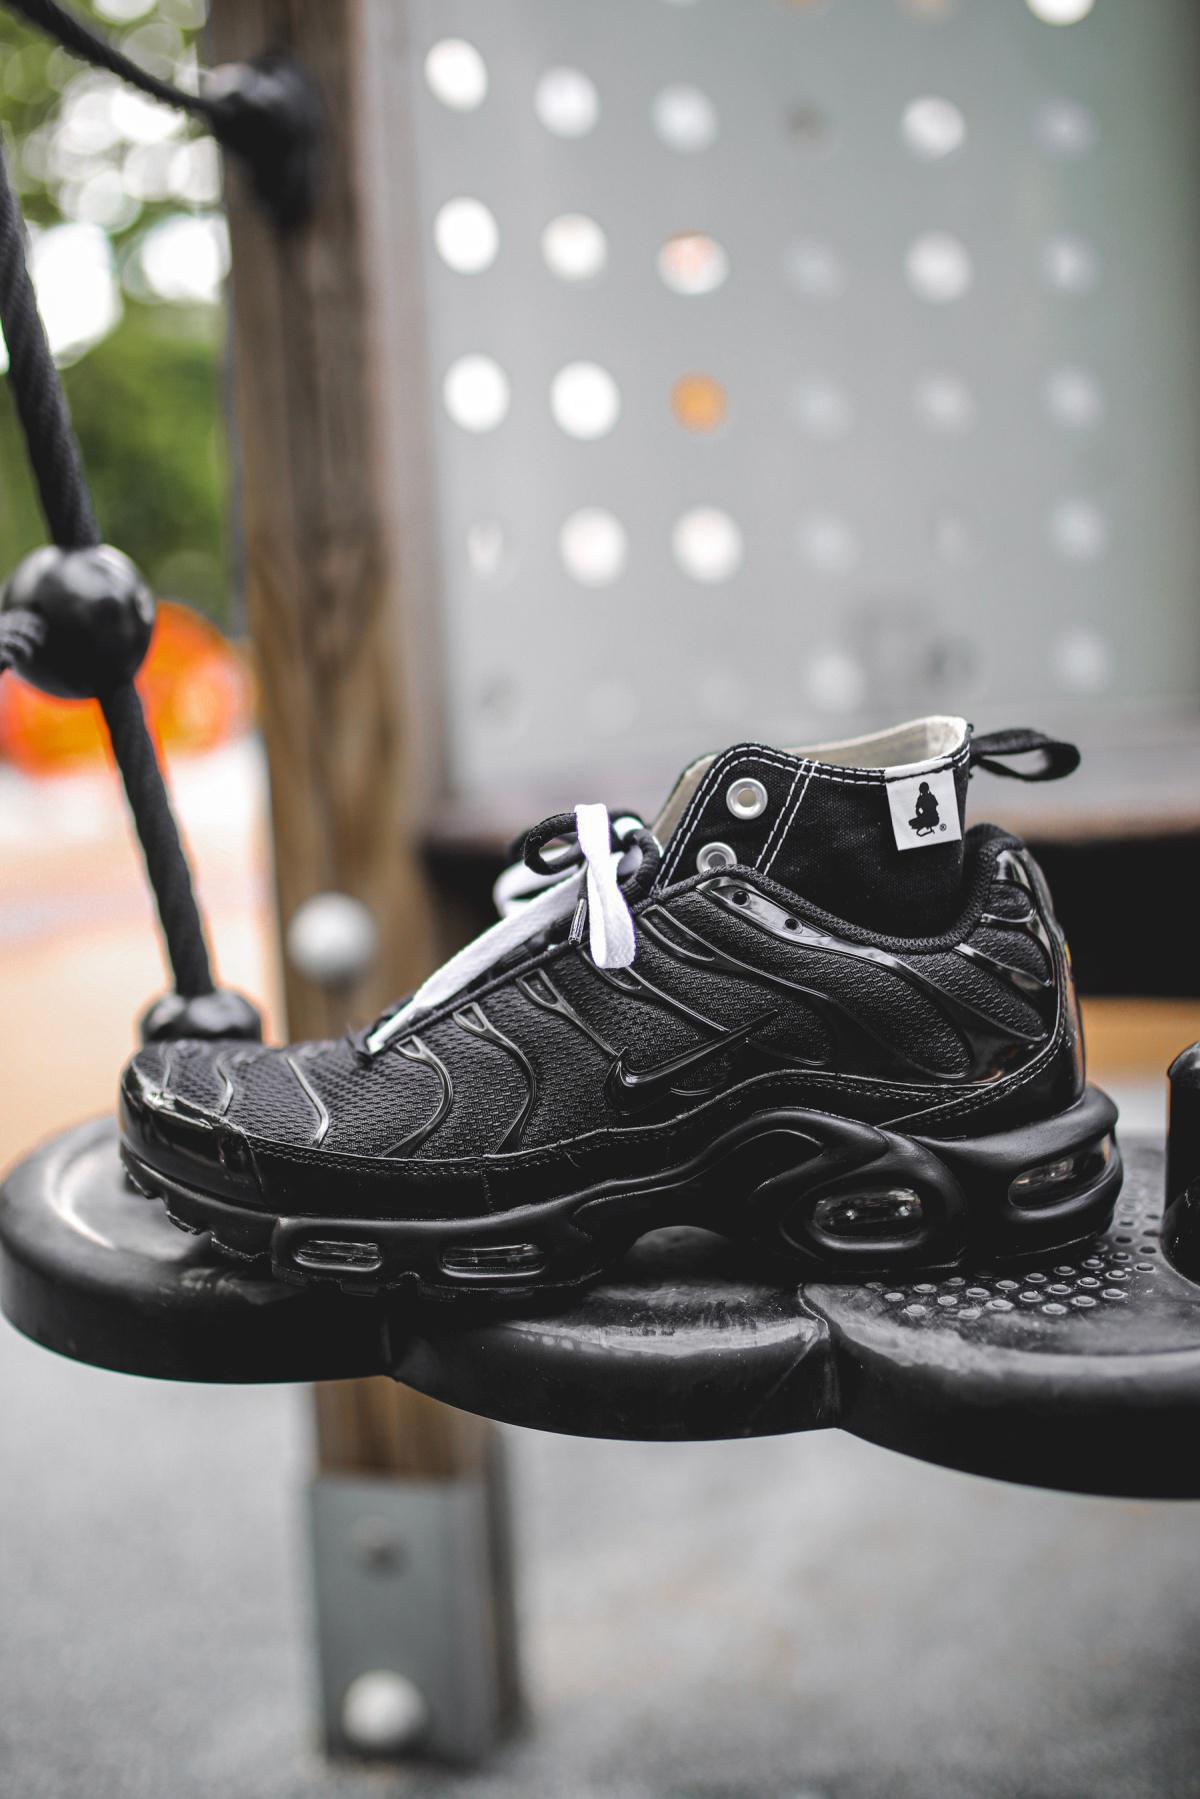 WWWESH STUDIO™ & Heightened Sense Nike Air Max Tn / Converse Chuck Taylor Hybrid